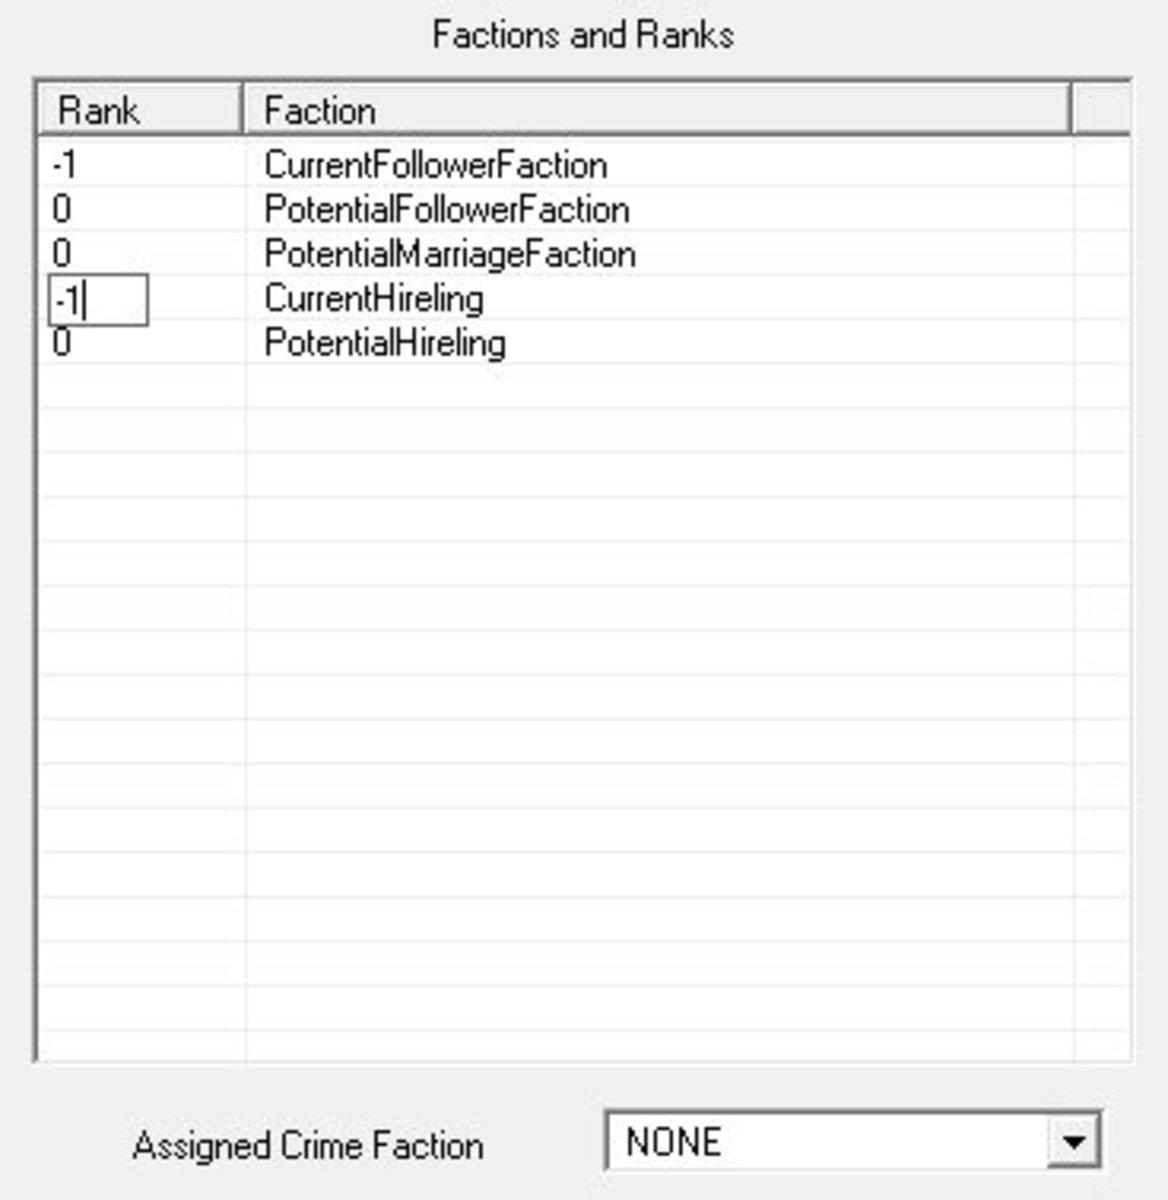 Edit the faction rank